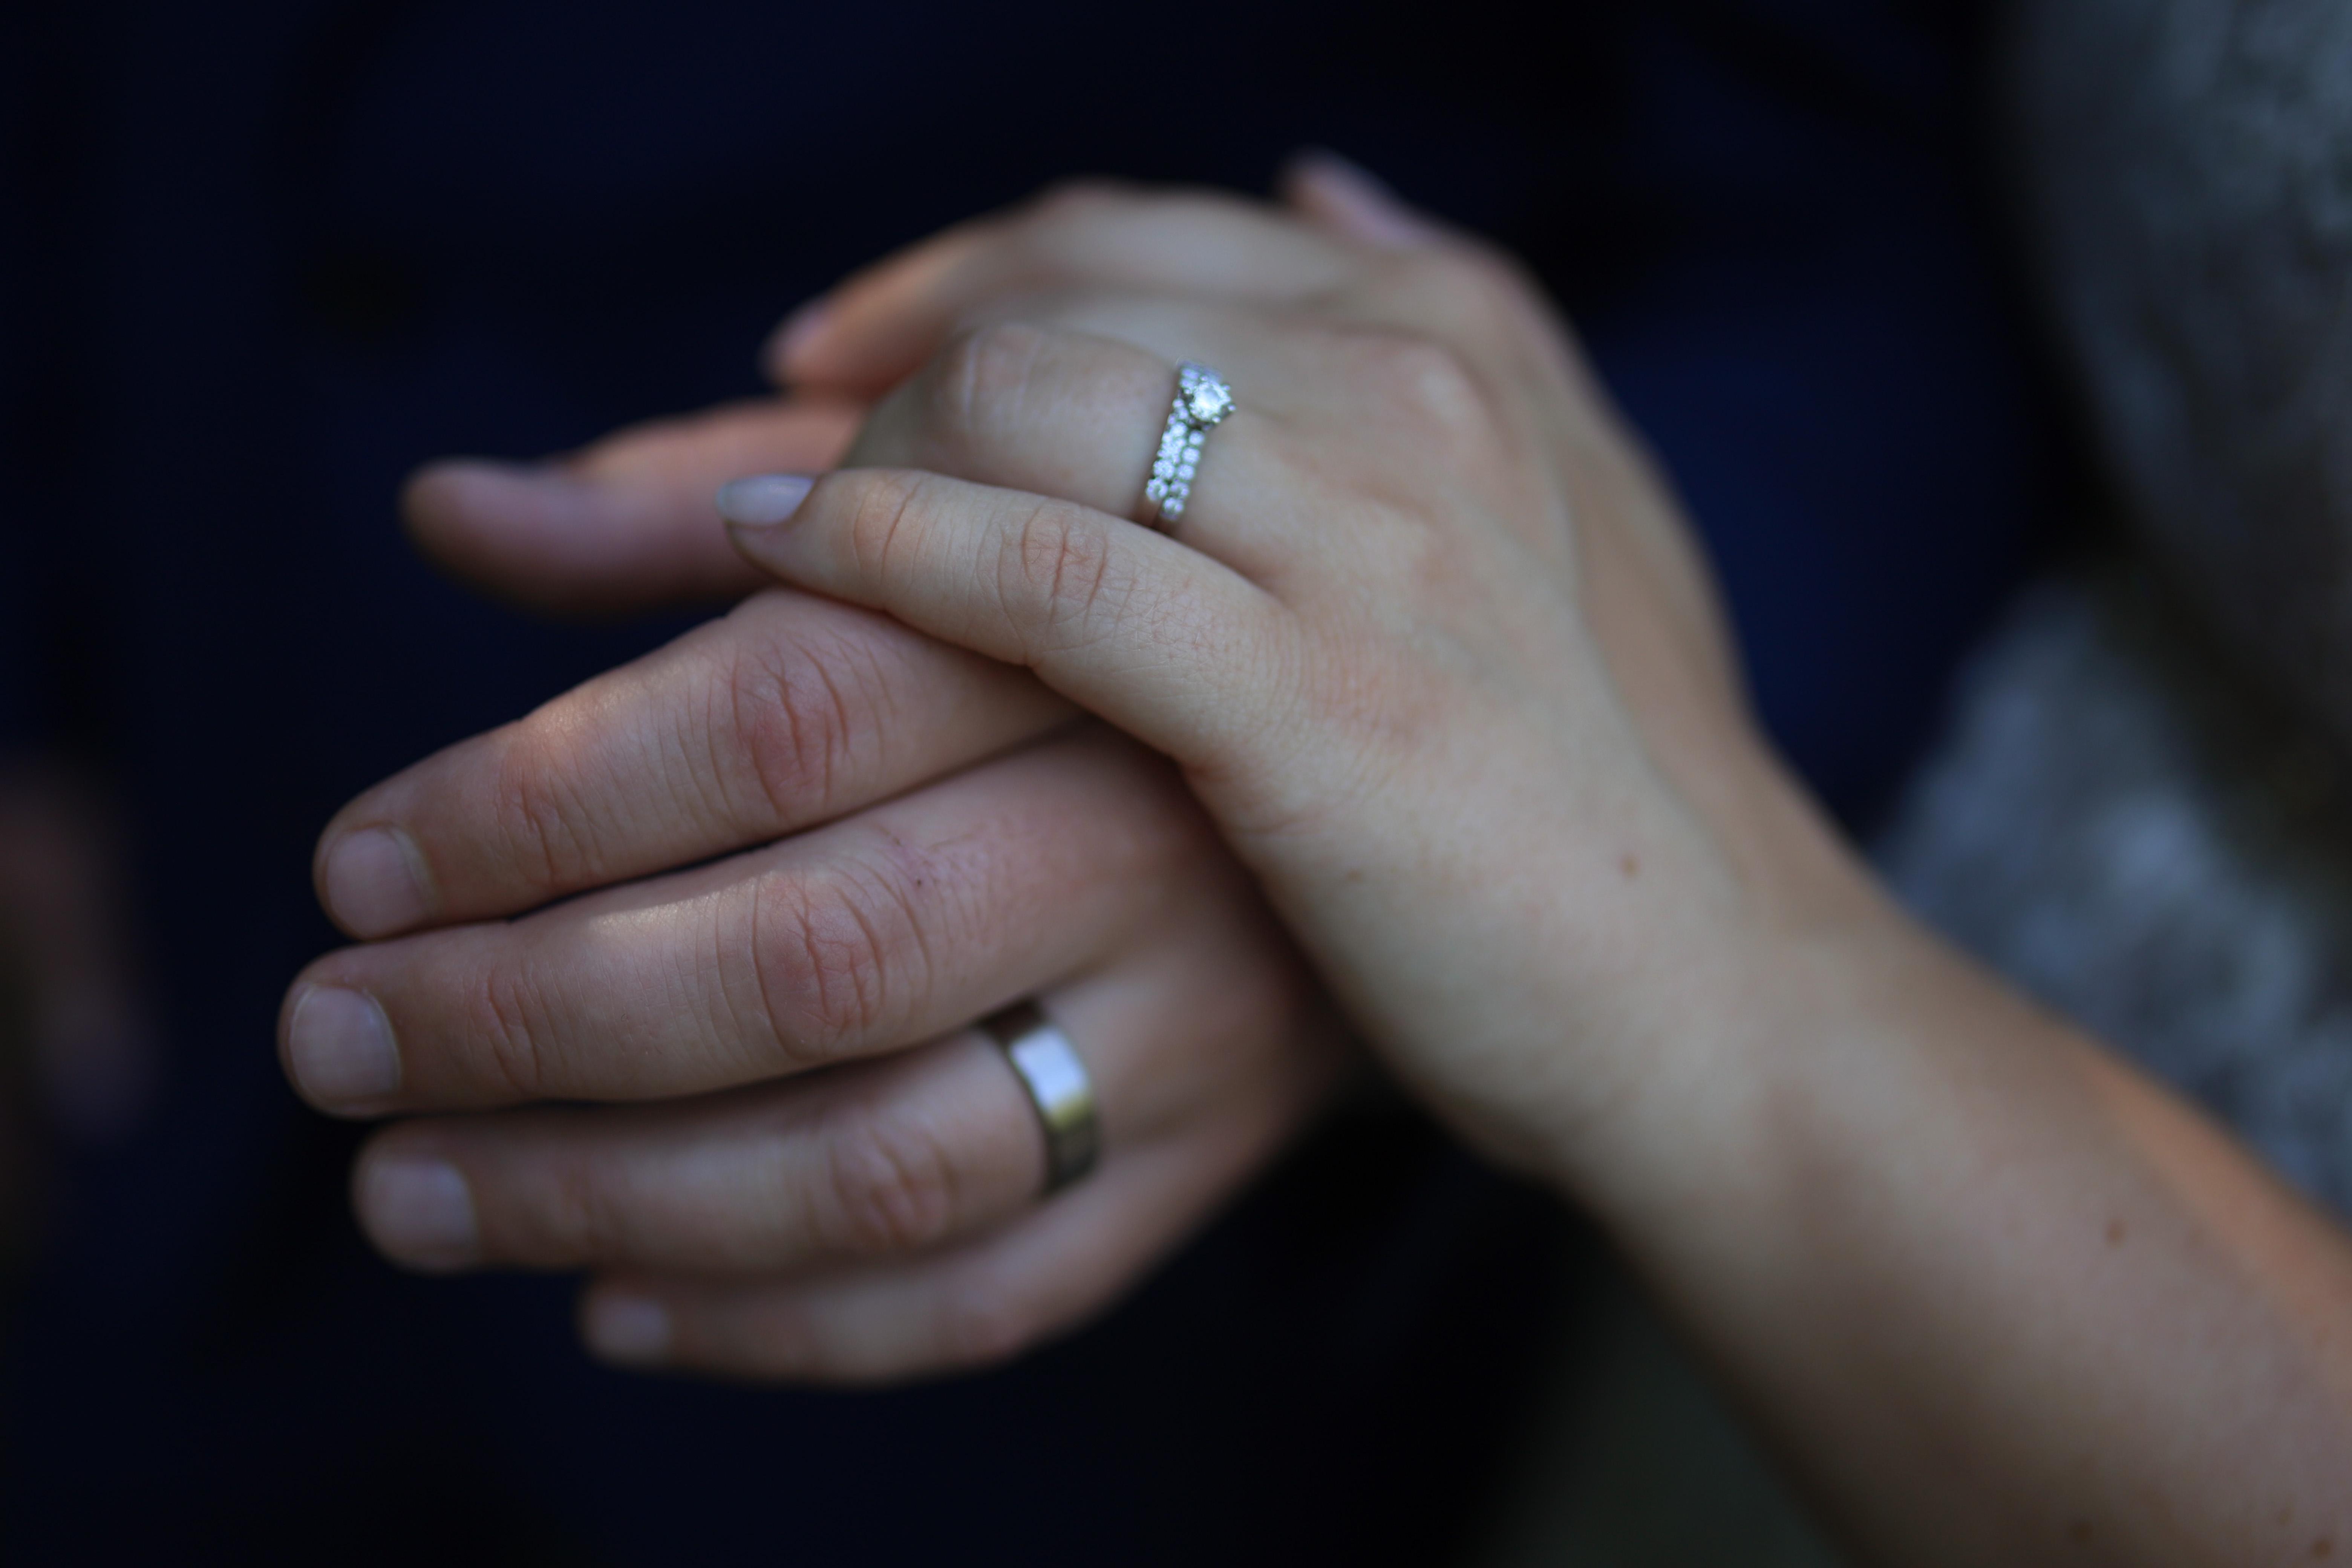 Ringfotos, Beautyshot-Hochzeitsfotografie, Brautpaar